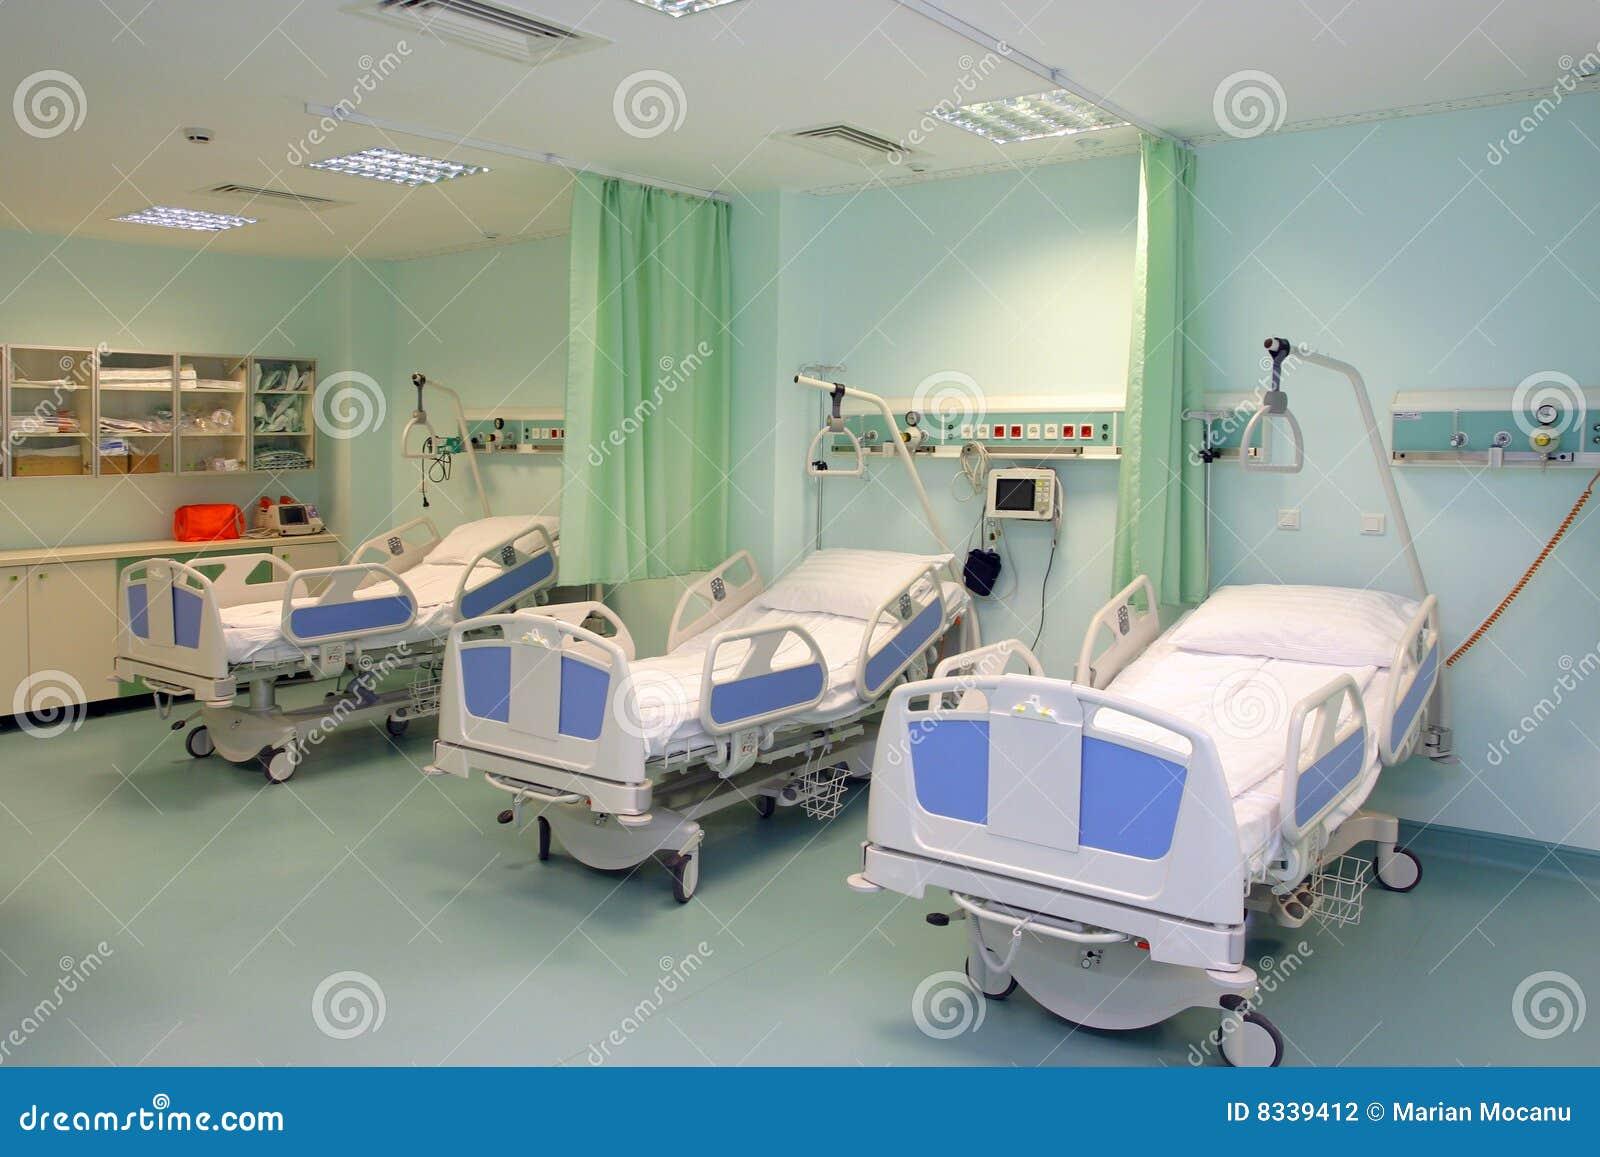 Hospital saloon